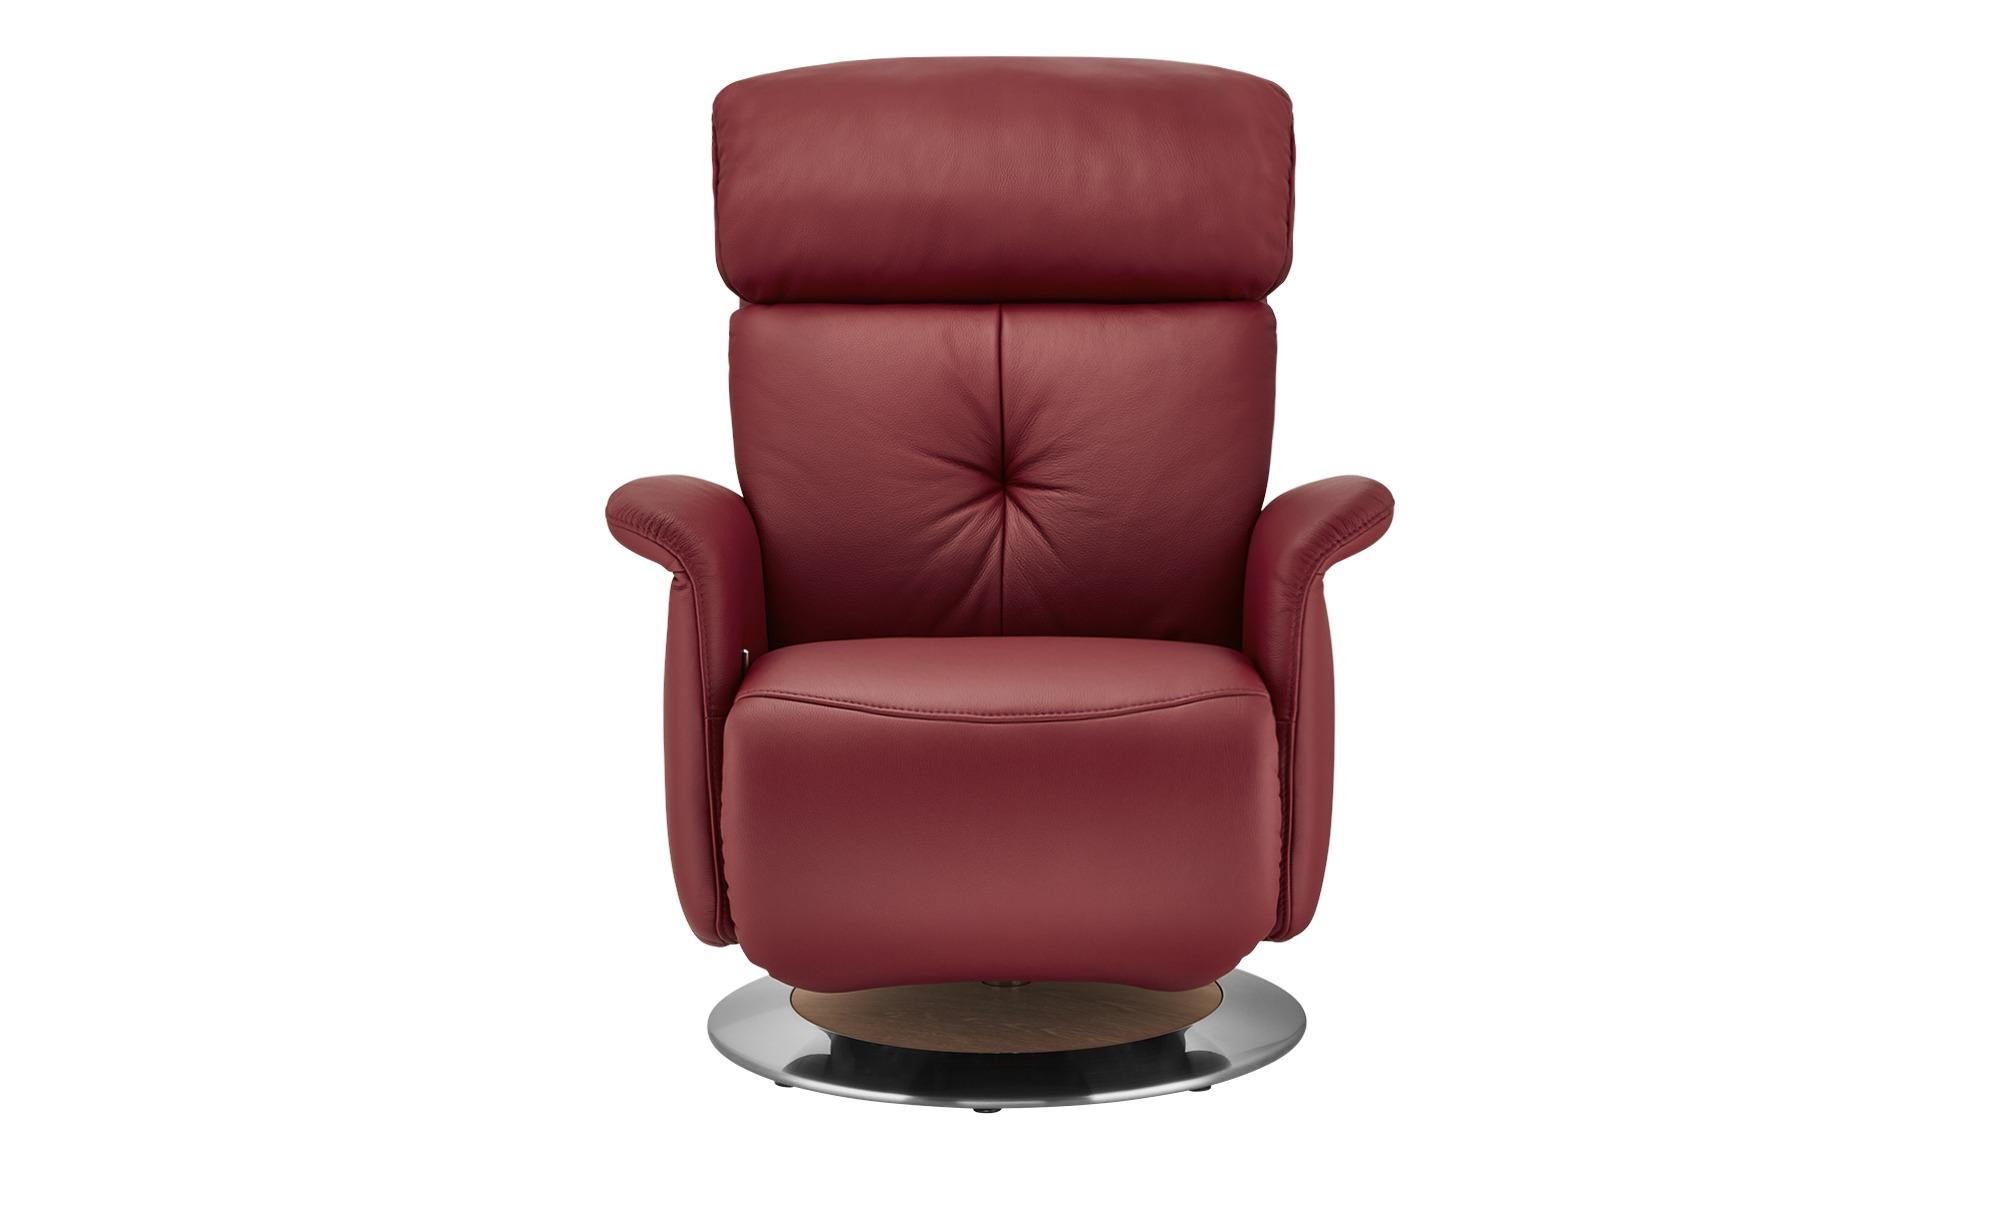 himolla Funktionssessel  7708 ¦ rot ¦ Maße (cm): B: 79 H: 99 T: 101 Polstermöbel > Sessel > Ledersessel - Höffner